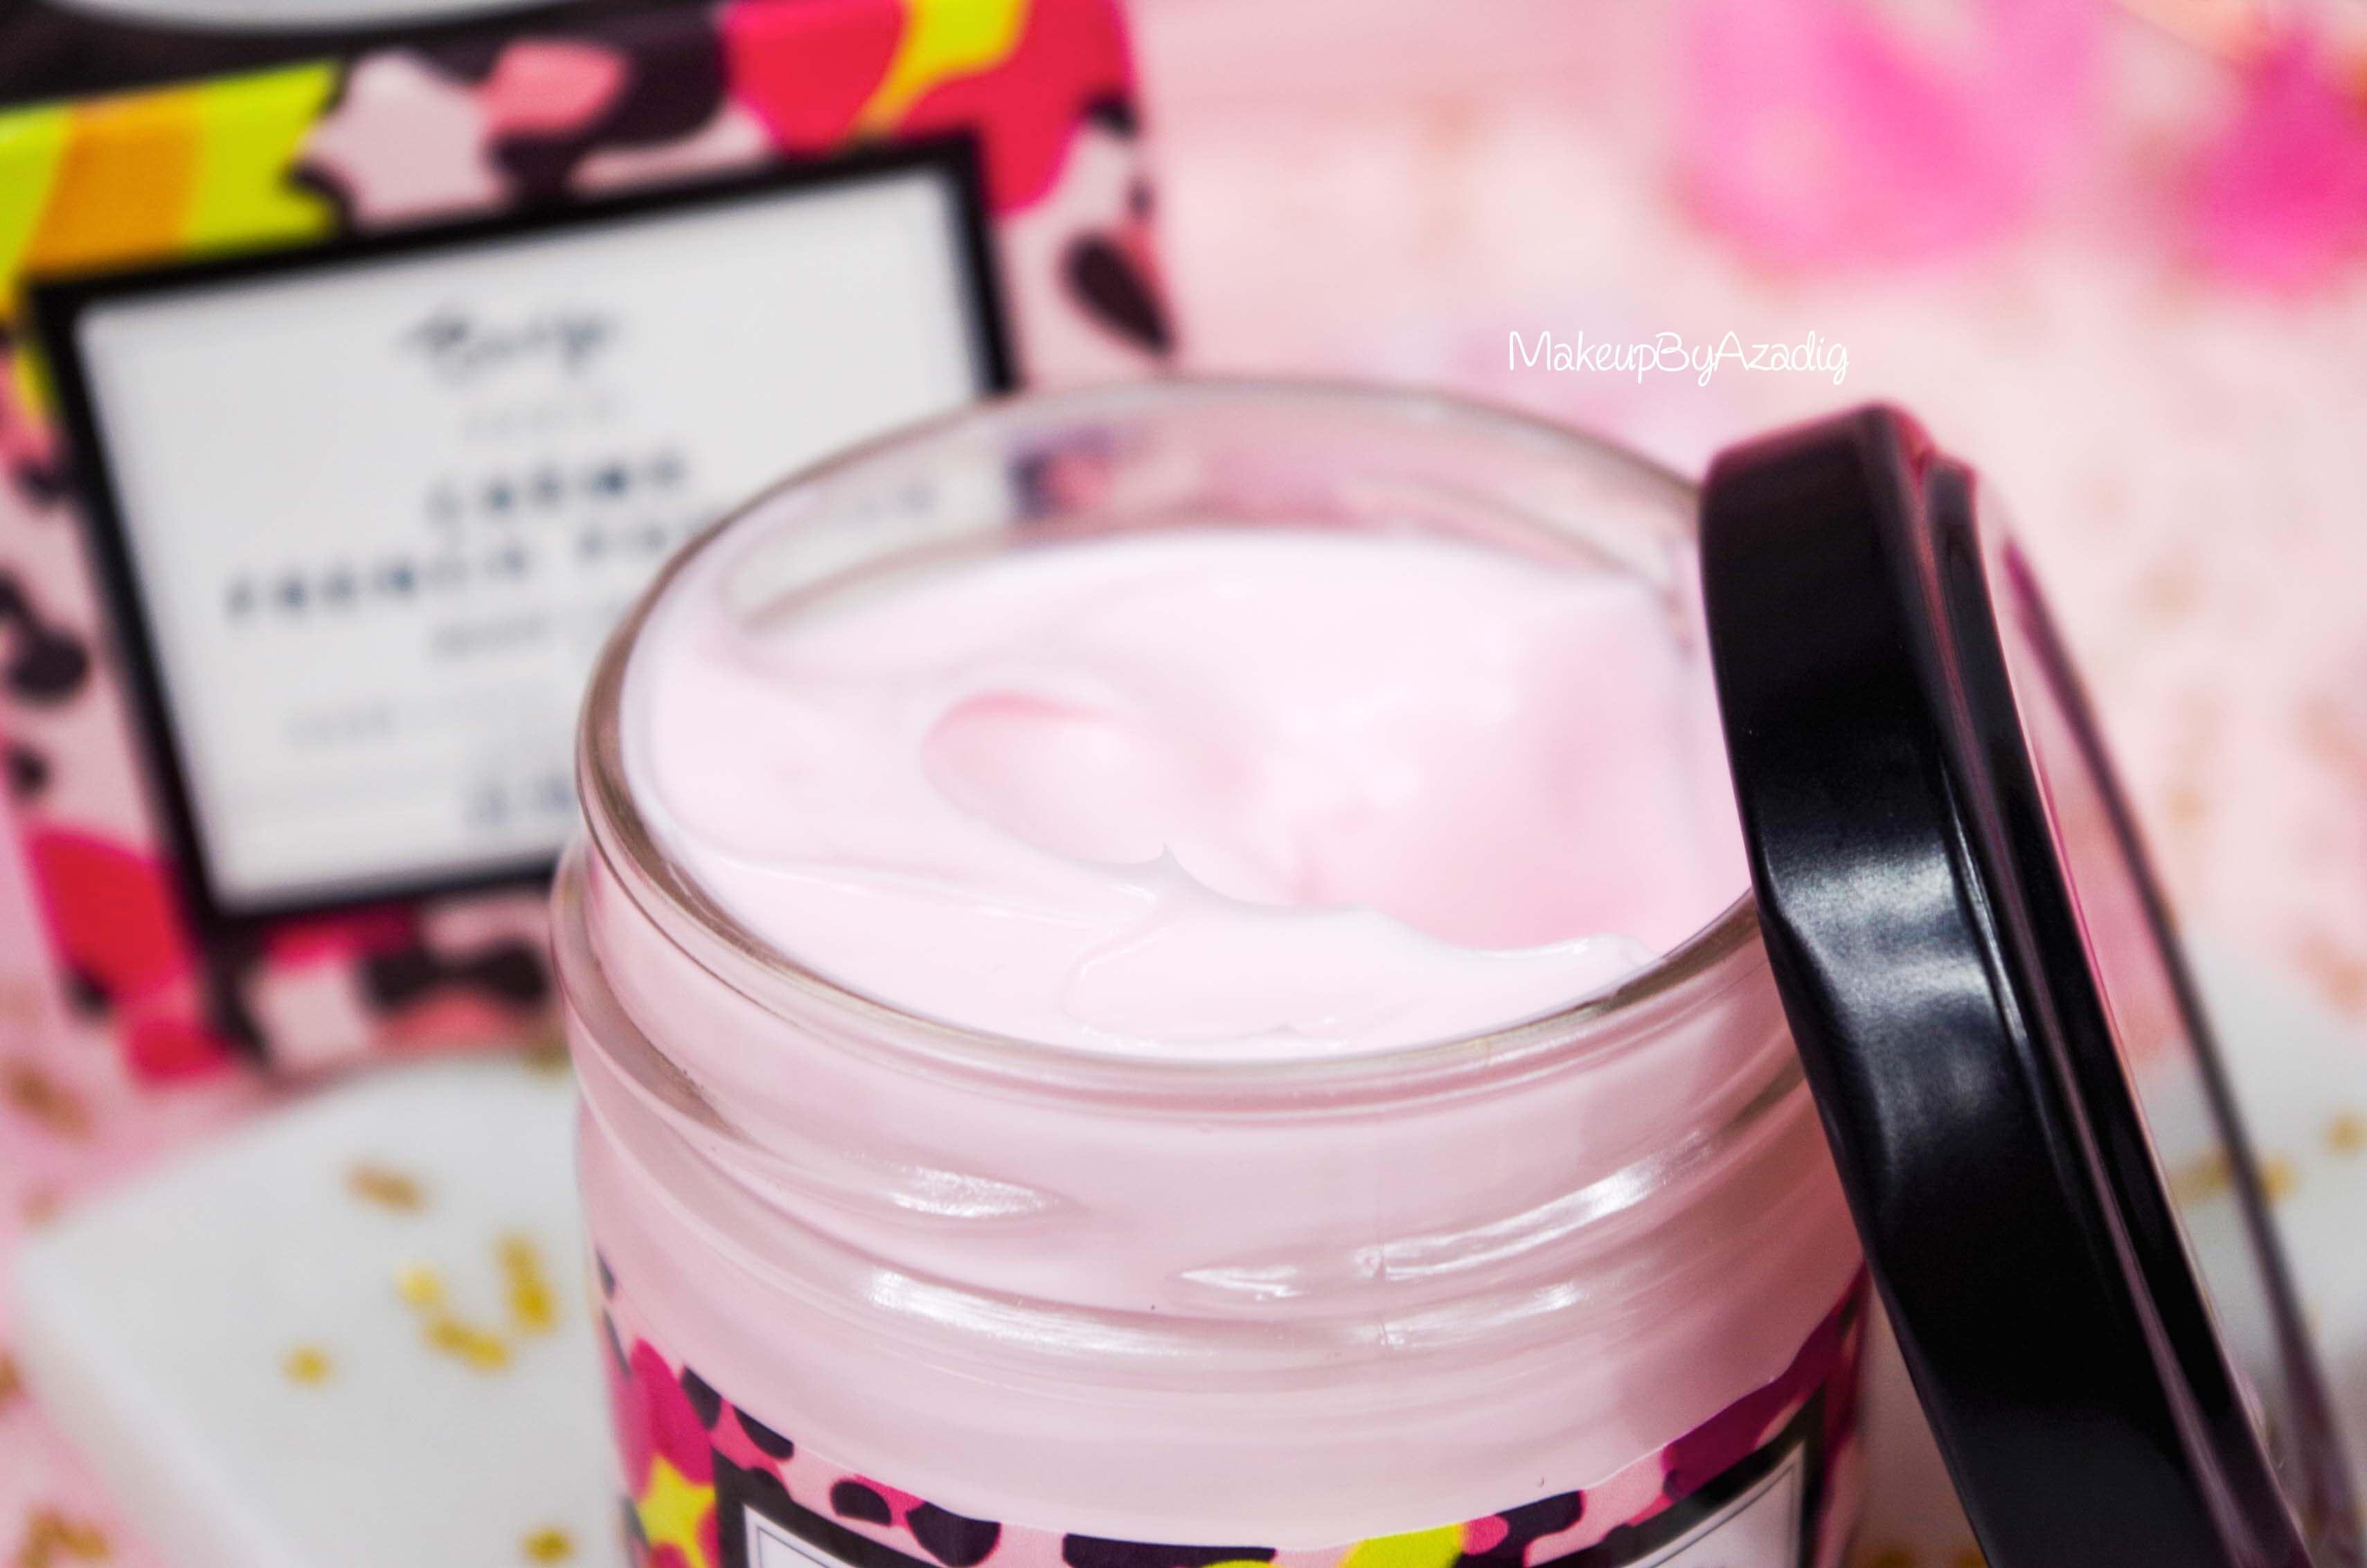 creme-corps-cream-body-french-pompon-baija-rose-litchi-sephora-makeupbyazadig-revue-prix-avis-texture